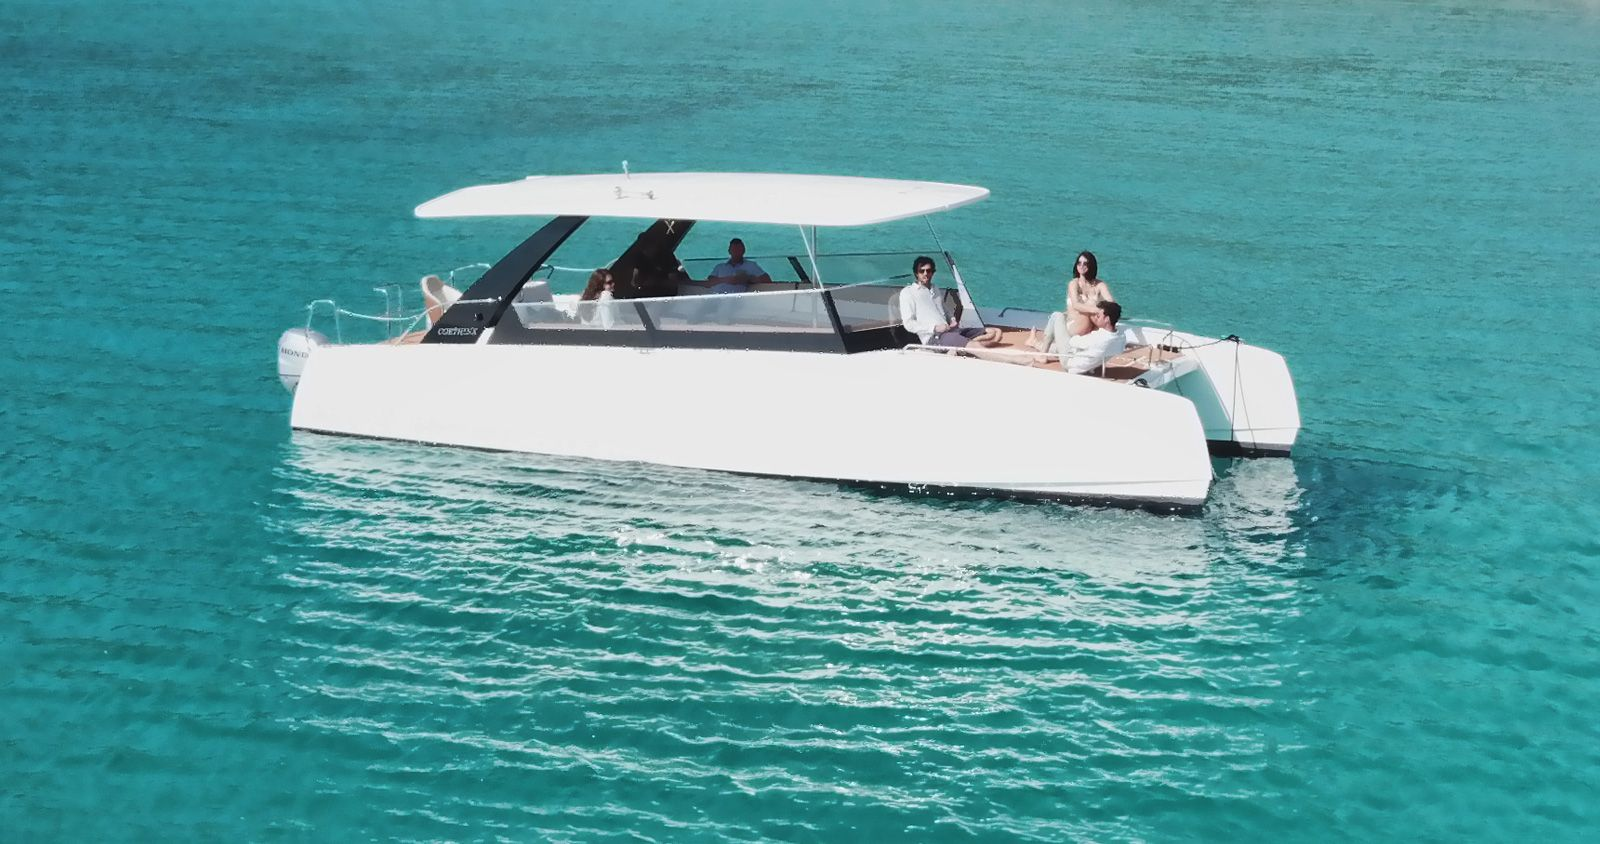 hight resolution of catamarans corthinx pontoon boat boat stuff boat plans catamaran product design